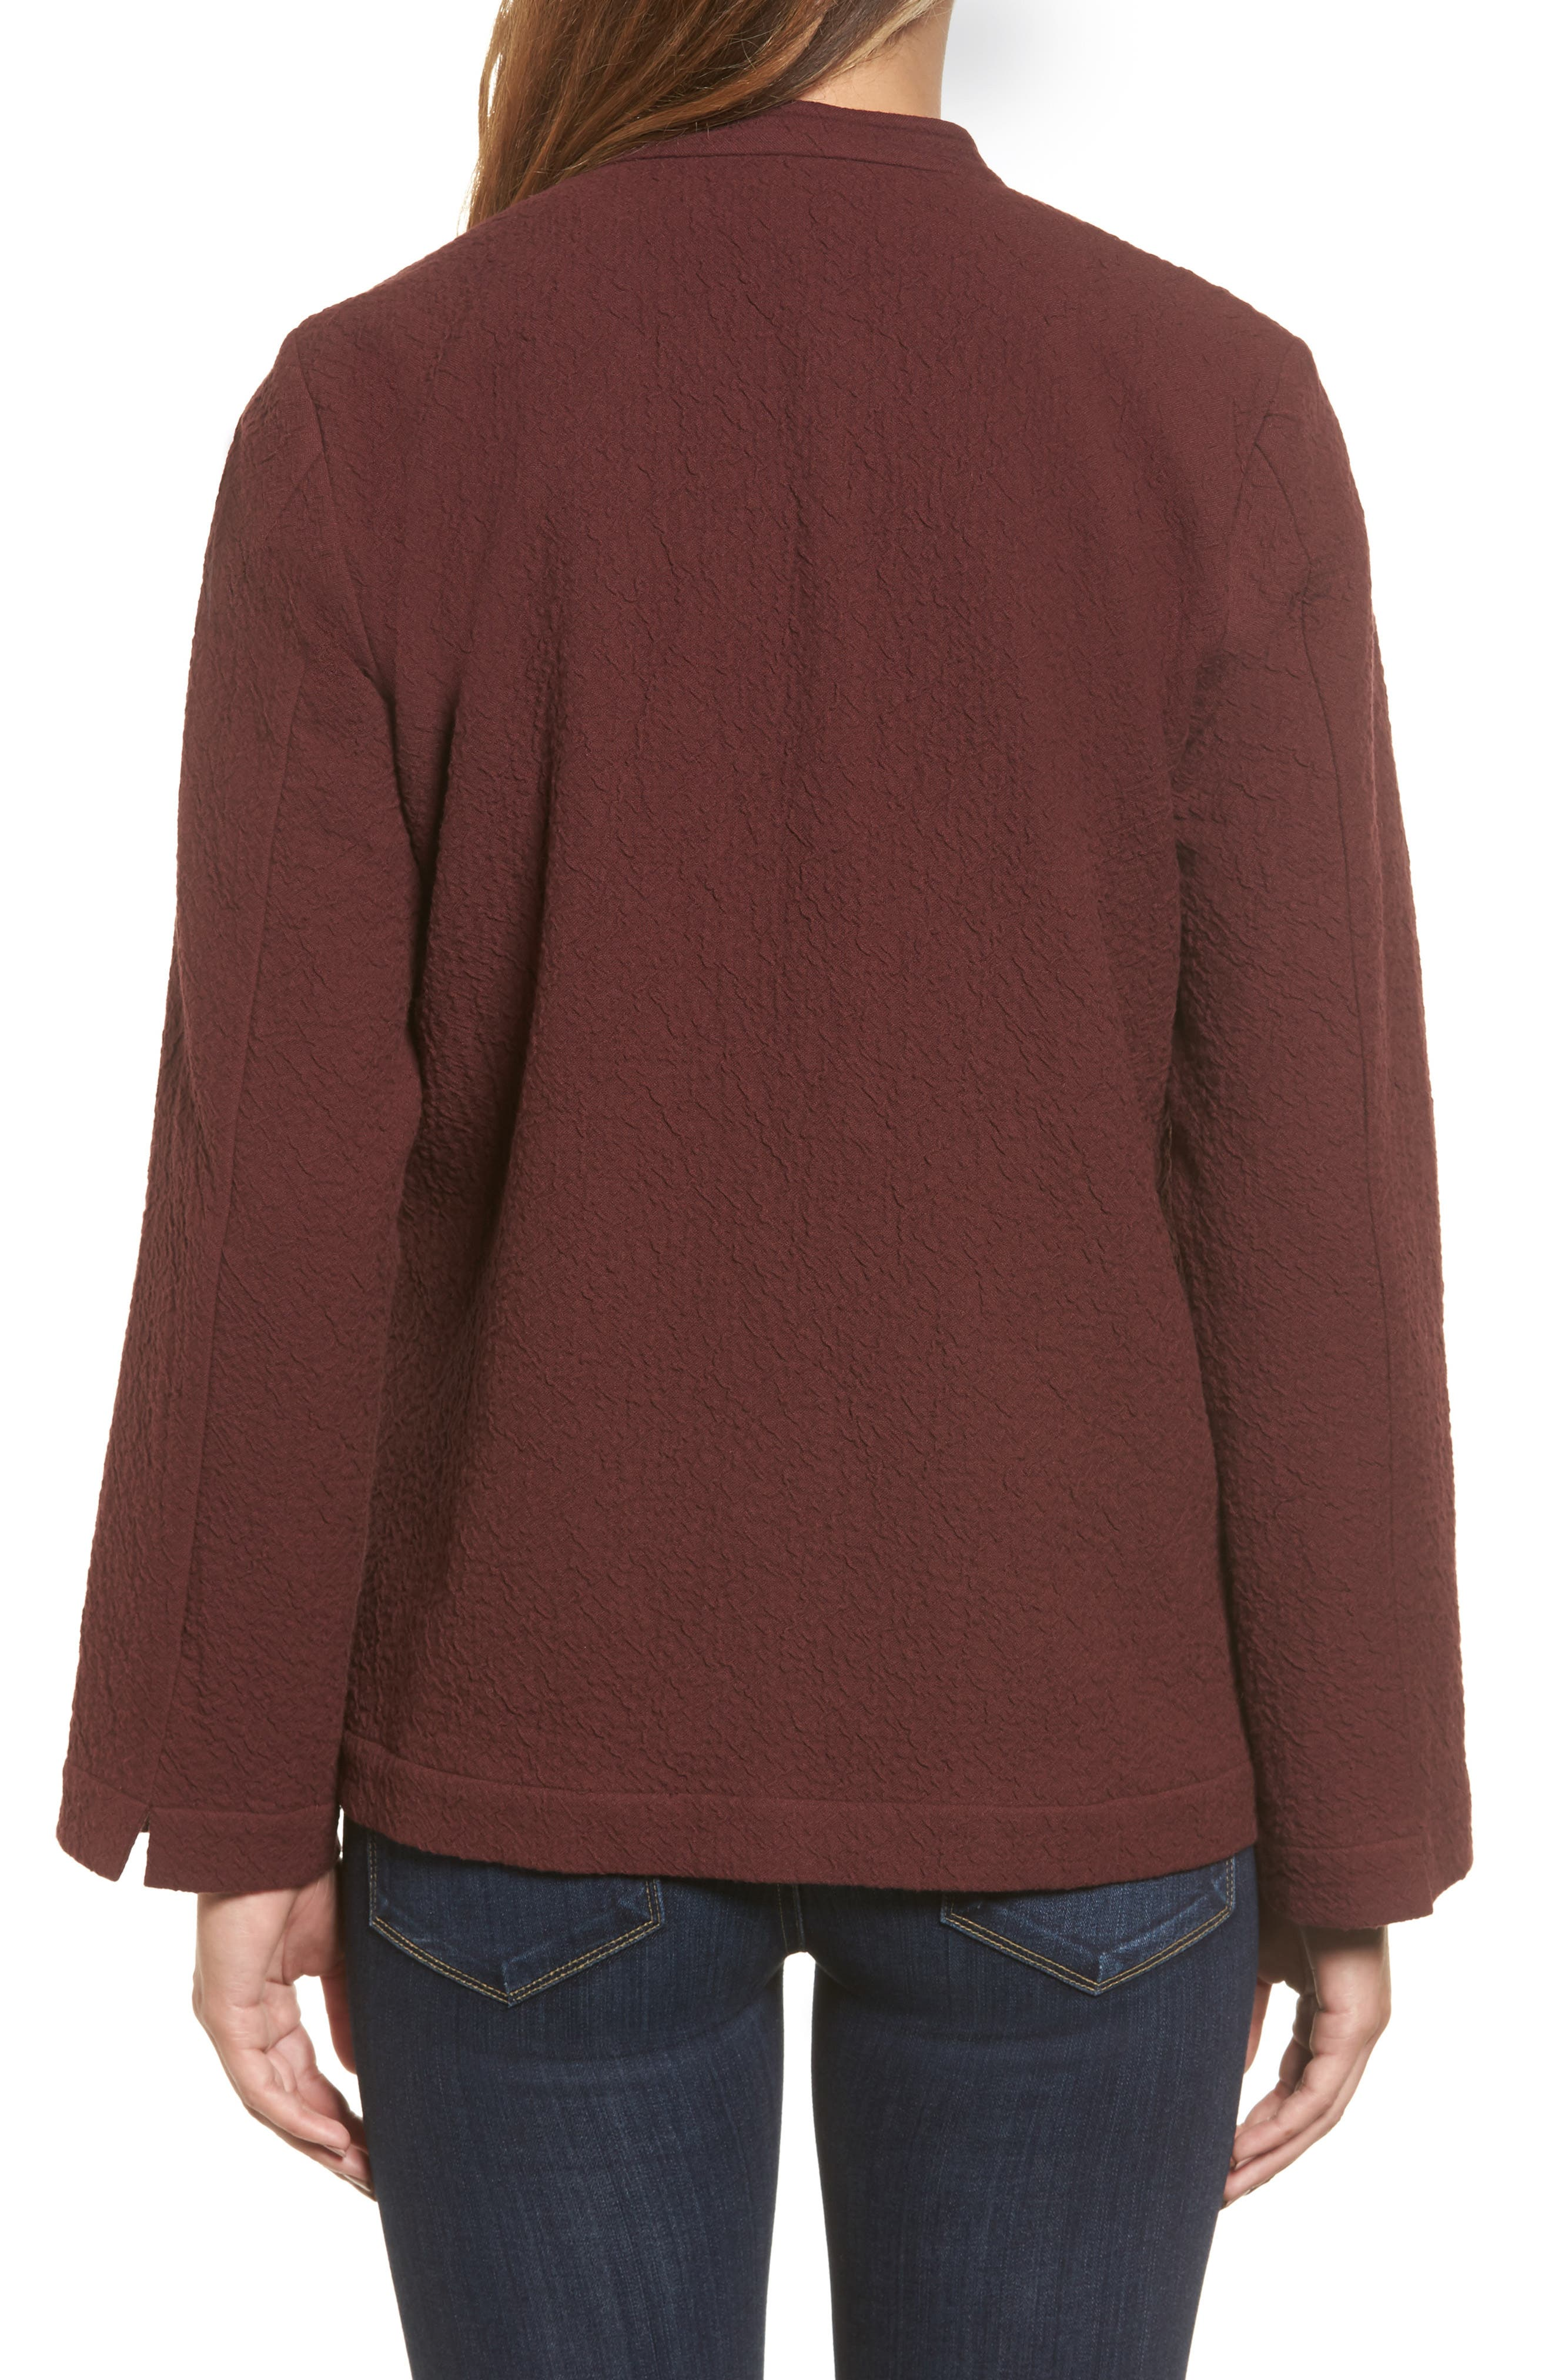 Organic Cotton Jacket,                             Alternate thumbnail 2, color,                             623